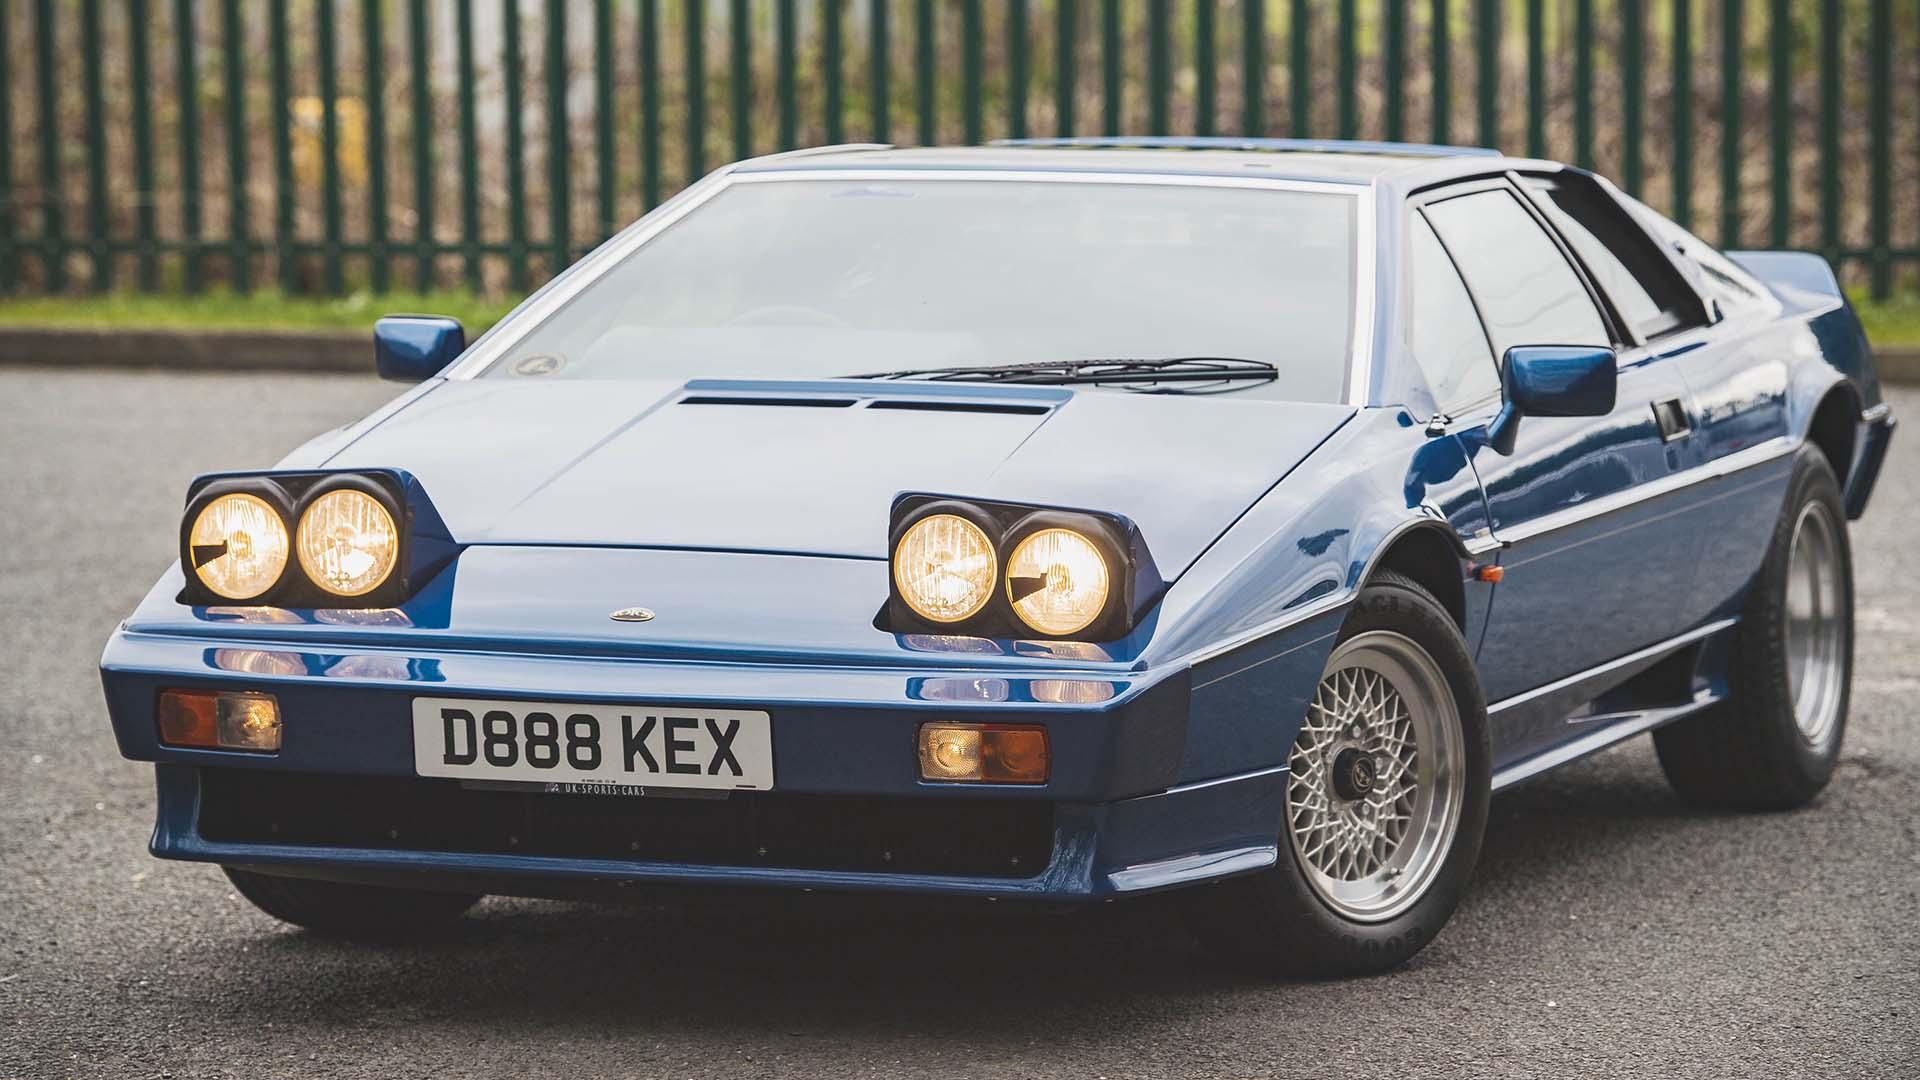 1987 LOTUS Esprit Turbo HC front angle 2